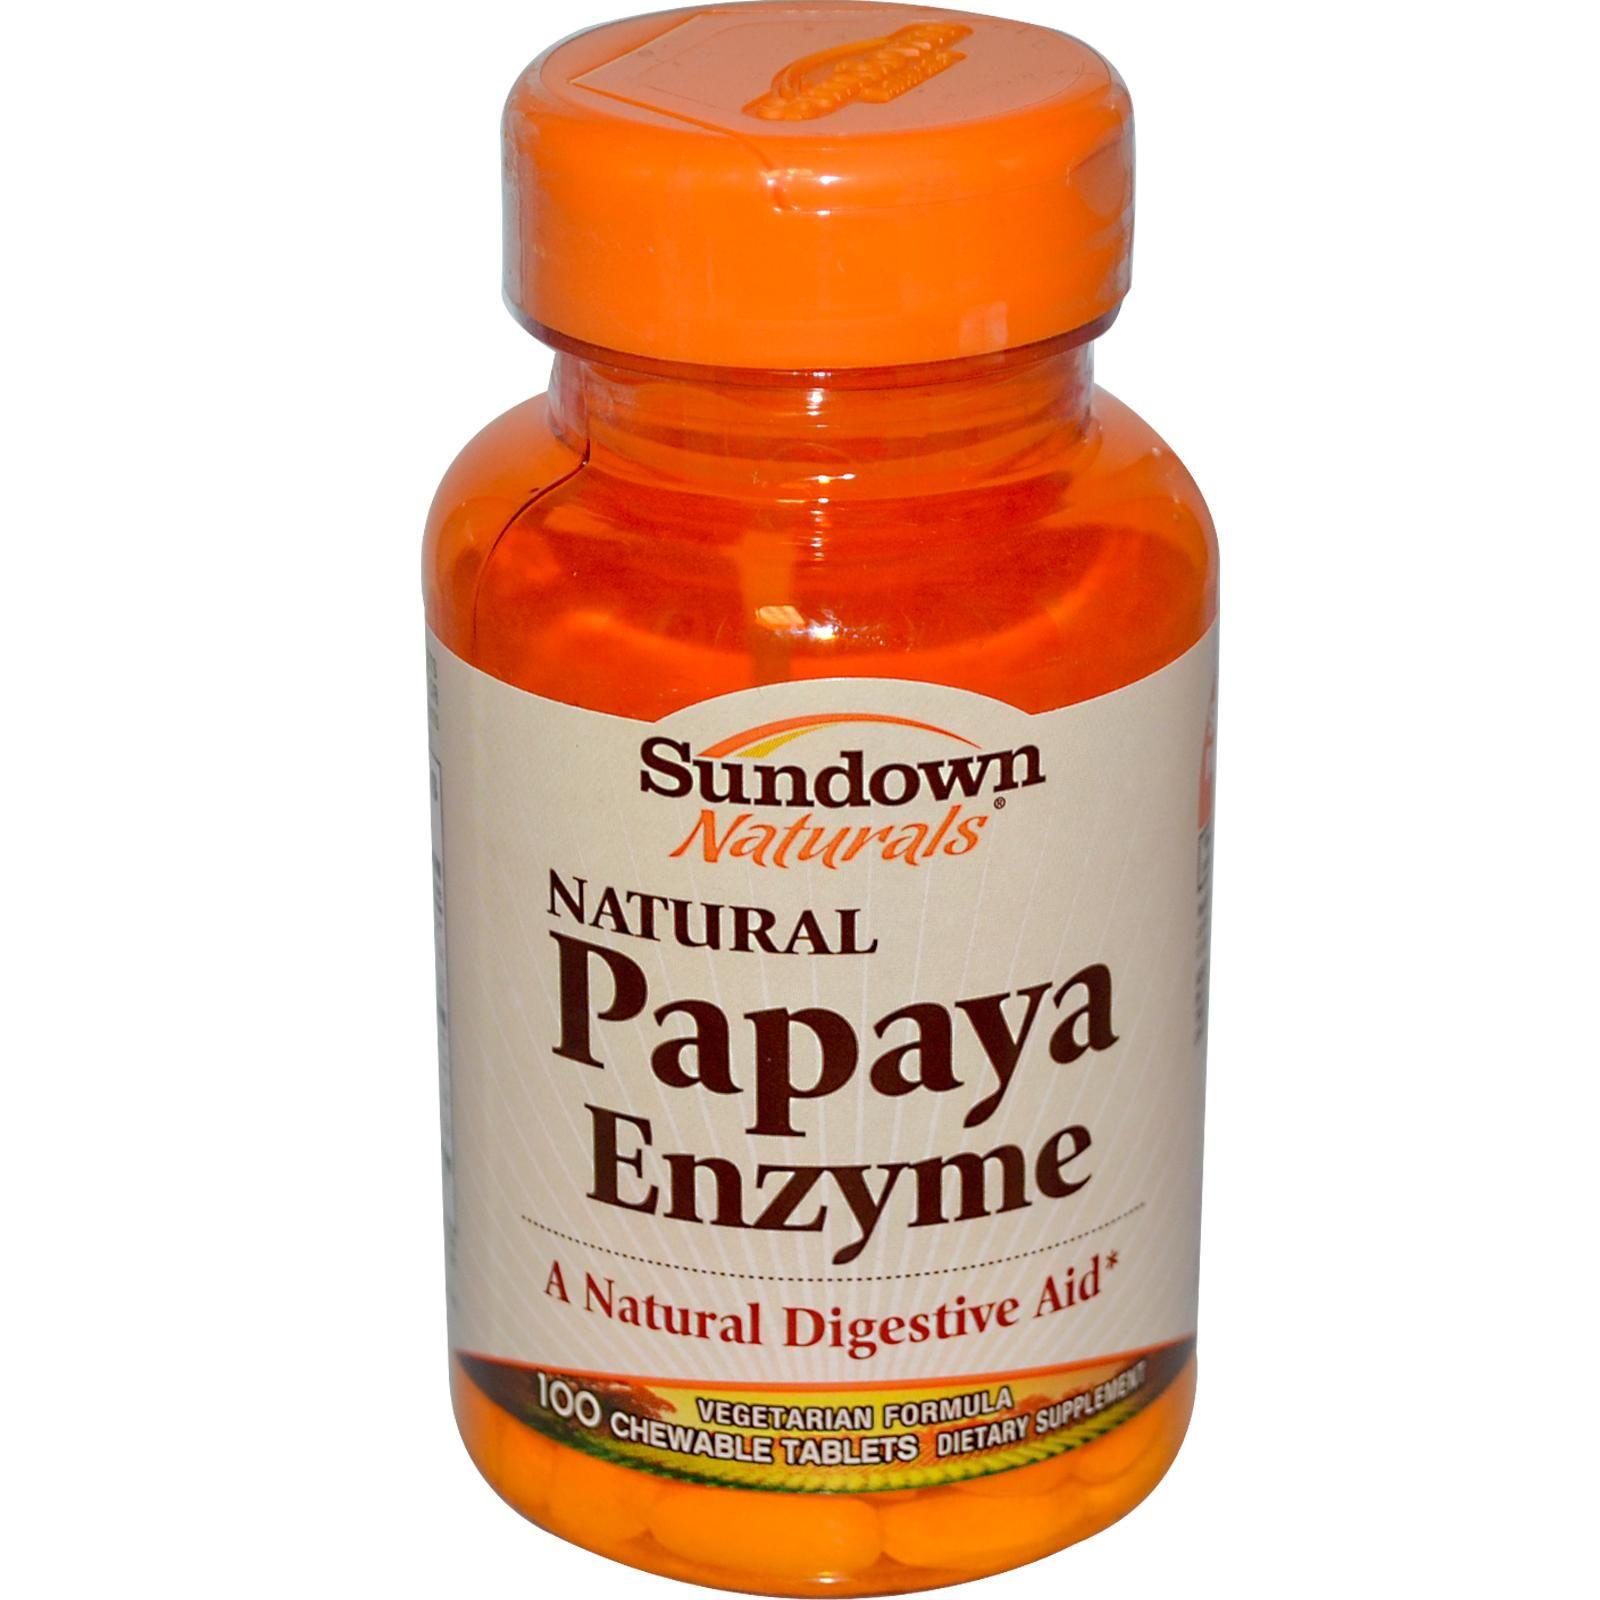 Rexall sundown naturals papaya enzyme 100 chewable tablets